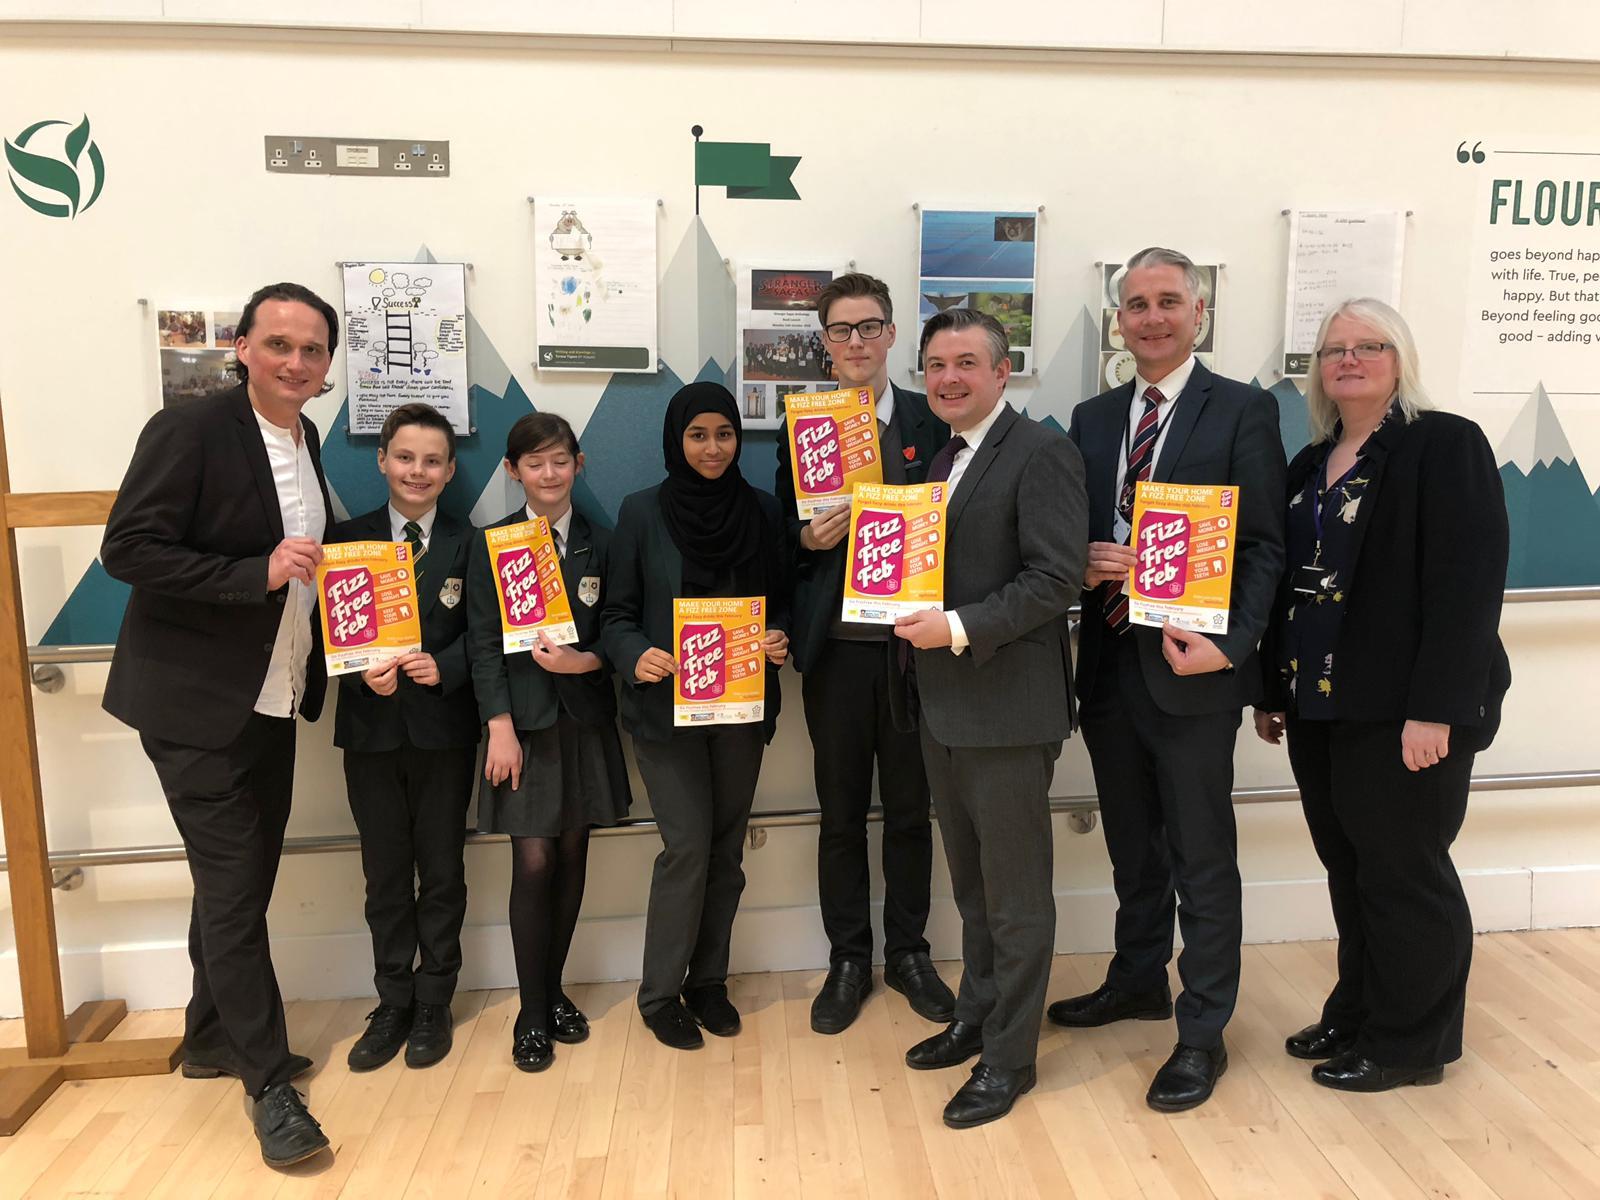 Jon and Councillor Clarke at Tudor Grange Samworth Academy as part of Fizz Free February - Friday February 8 2019